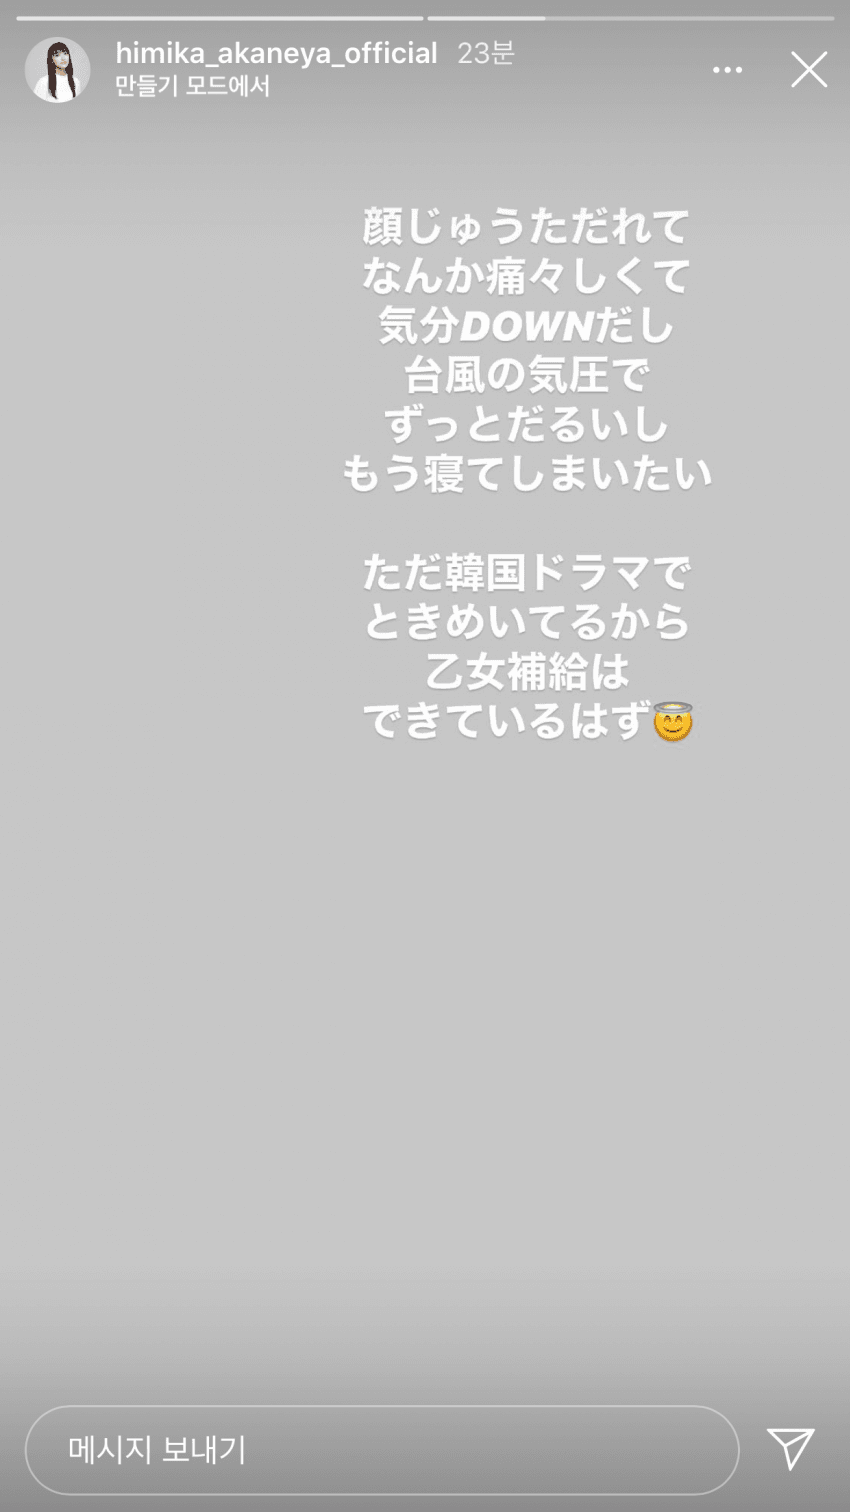 viewimage.php?no=24b0d769e1d32ca73cec87fa11d0283141b58444220b0c04398dc02aecdf06e8ad82f474efc39e7e0220bc4fd5a14dc1e245c005d0ed42efad1016d21bd0766598eaa2462a56a11784d501c59538c6874e43c916a72ed288b2c70245deca16369522423bb886d475a016481c4c